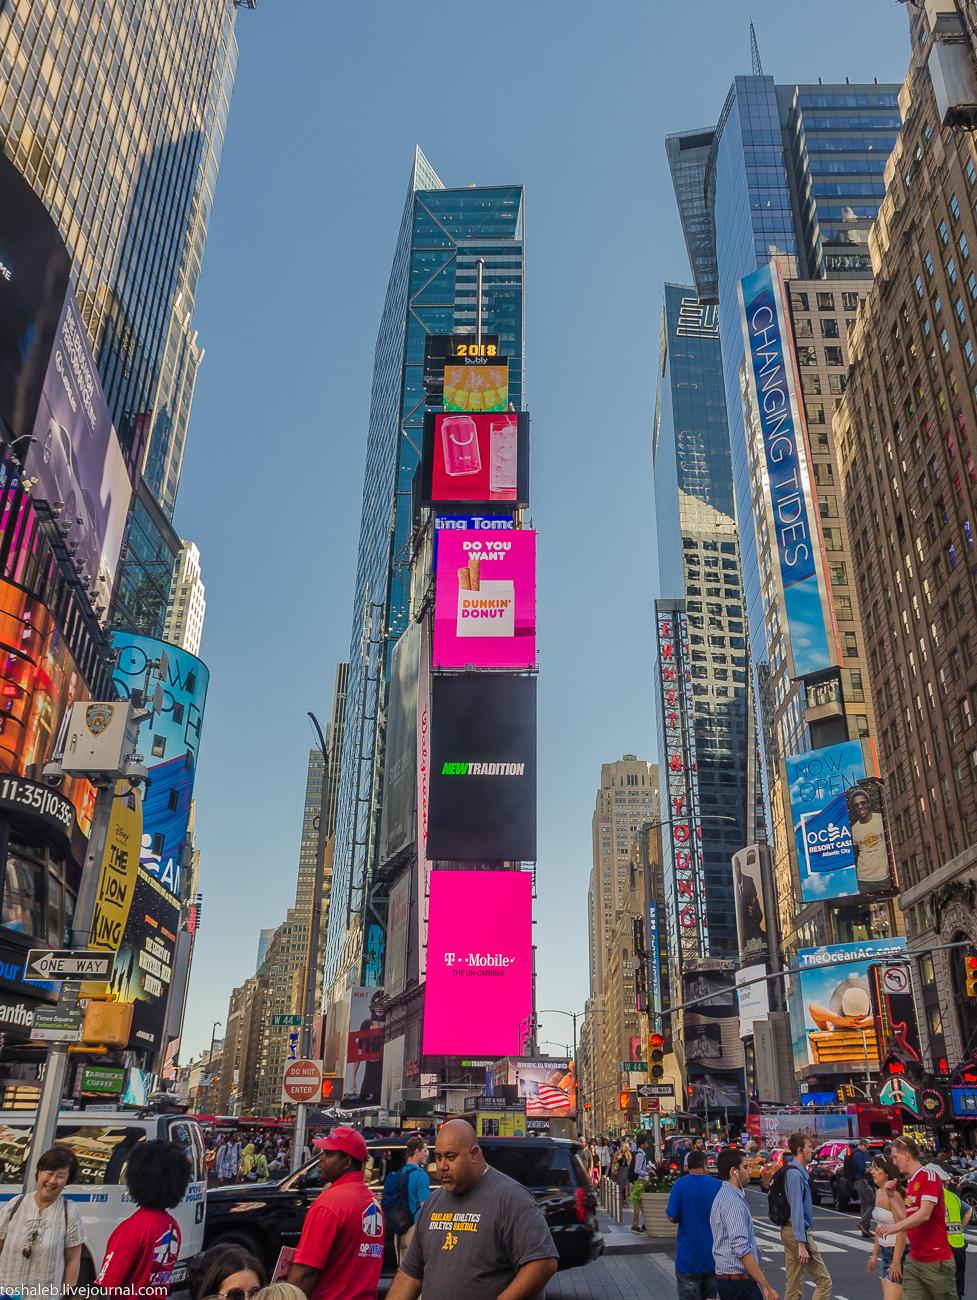 Нью-Йорк_Central Park_Times Square-66